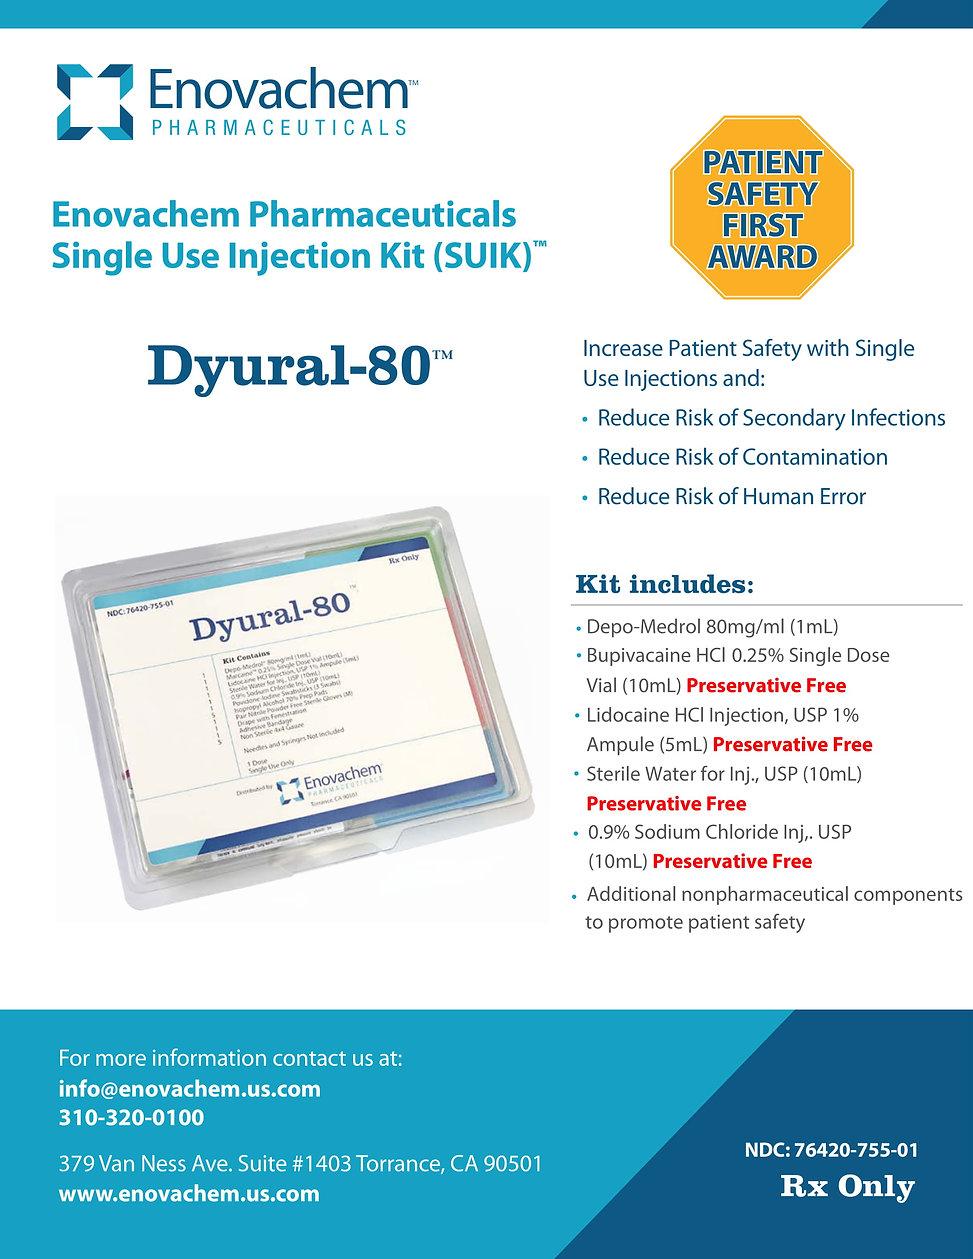 Dyural-80